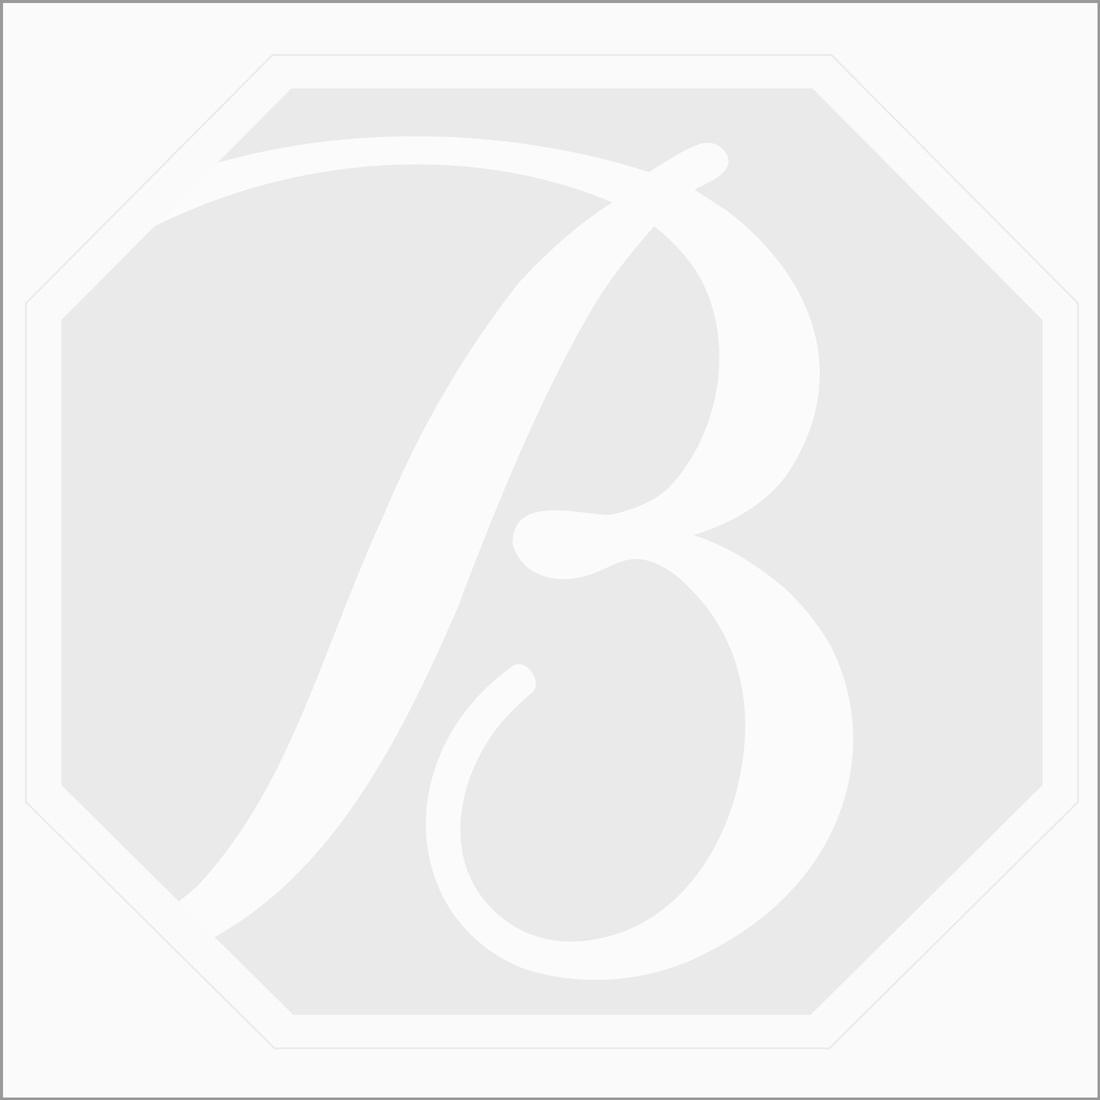 2 Brown Diamond Cushion Shape Rose Cut Diamonds - 3.99 cts. (DRC1284)